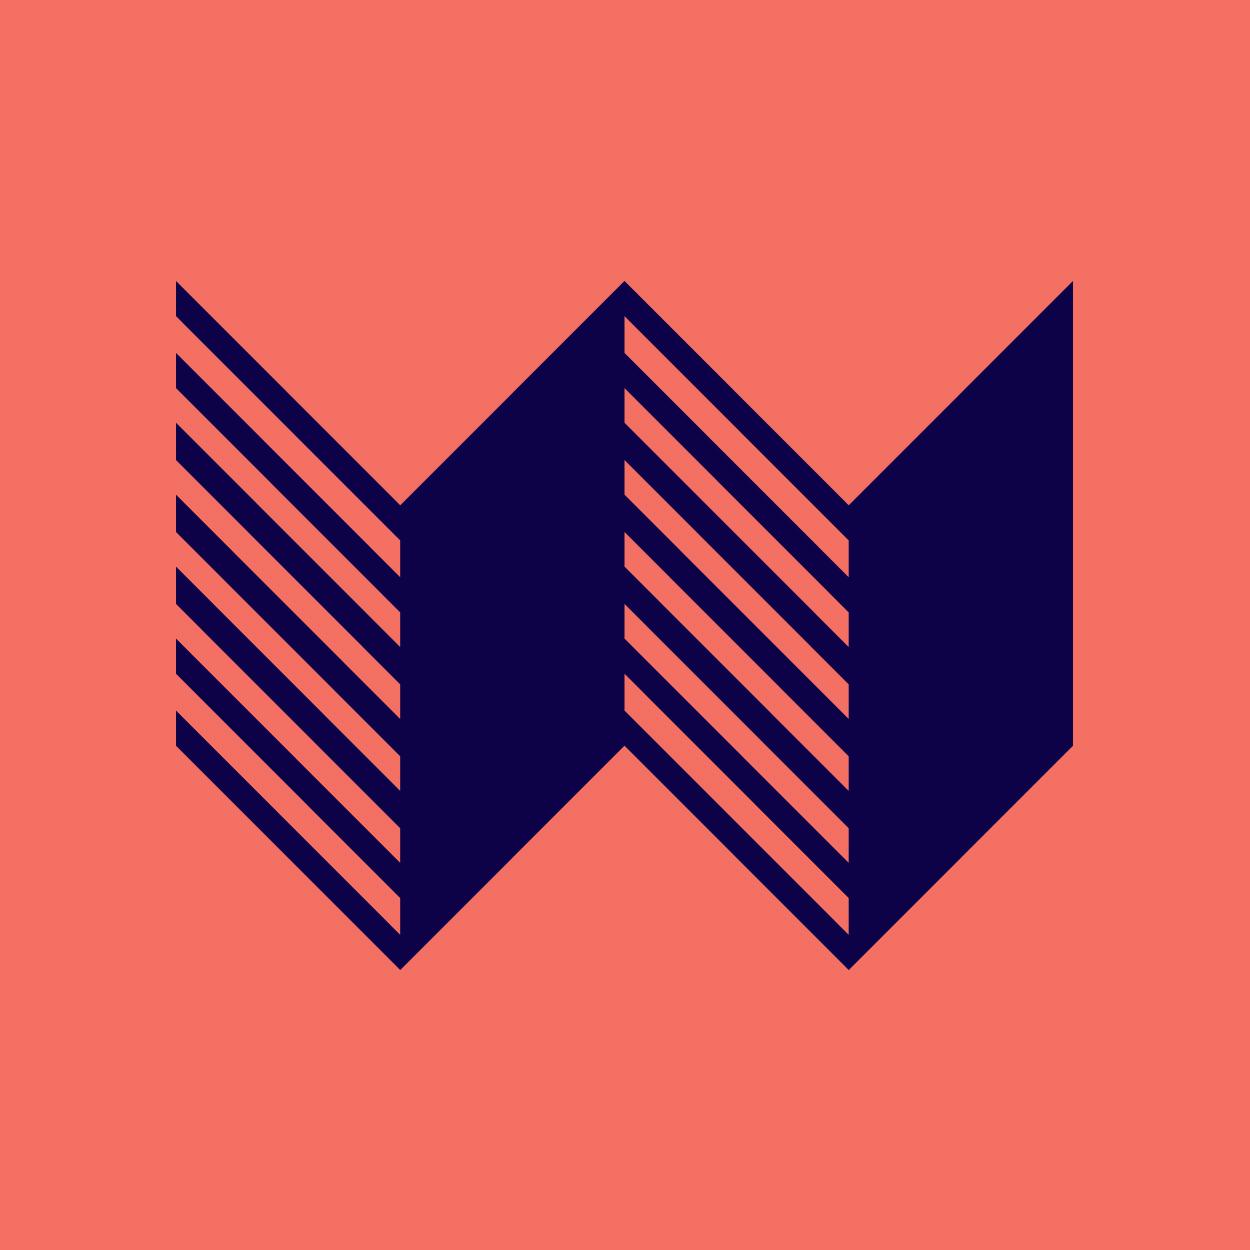 Waterford - Branding + Signage